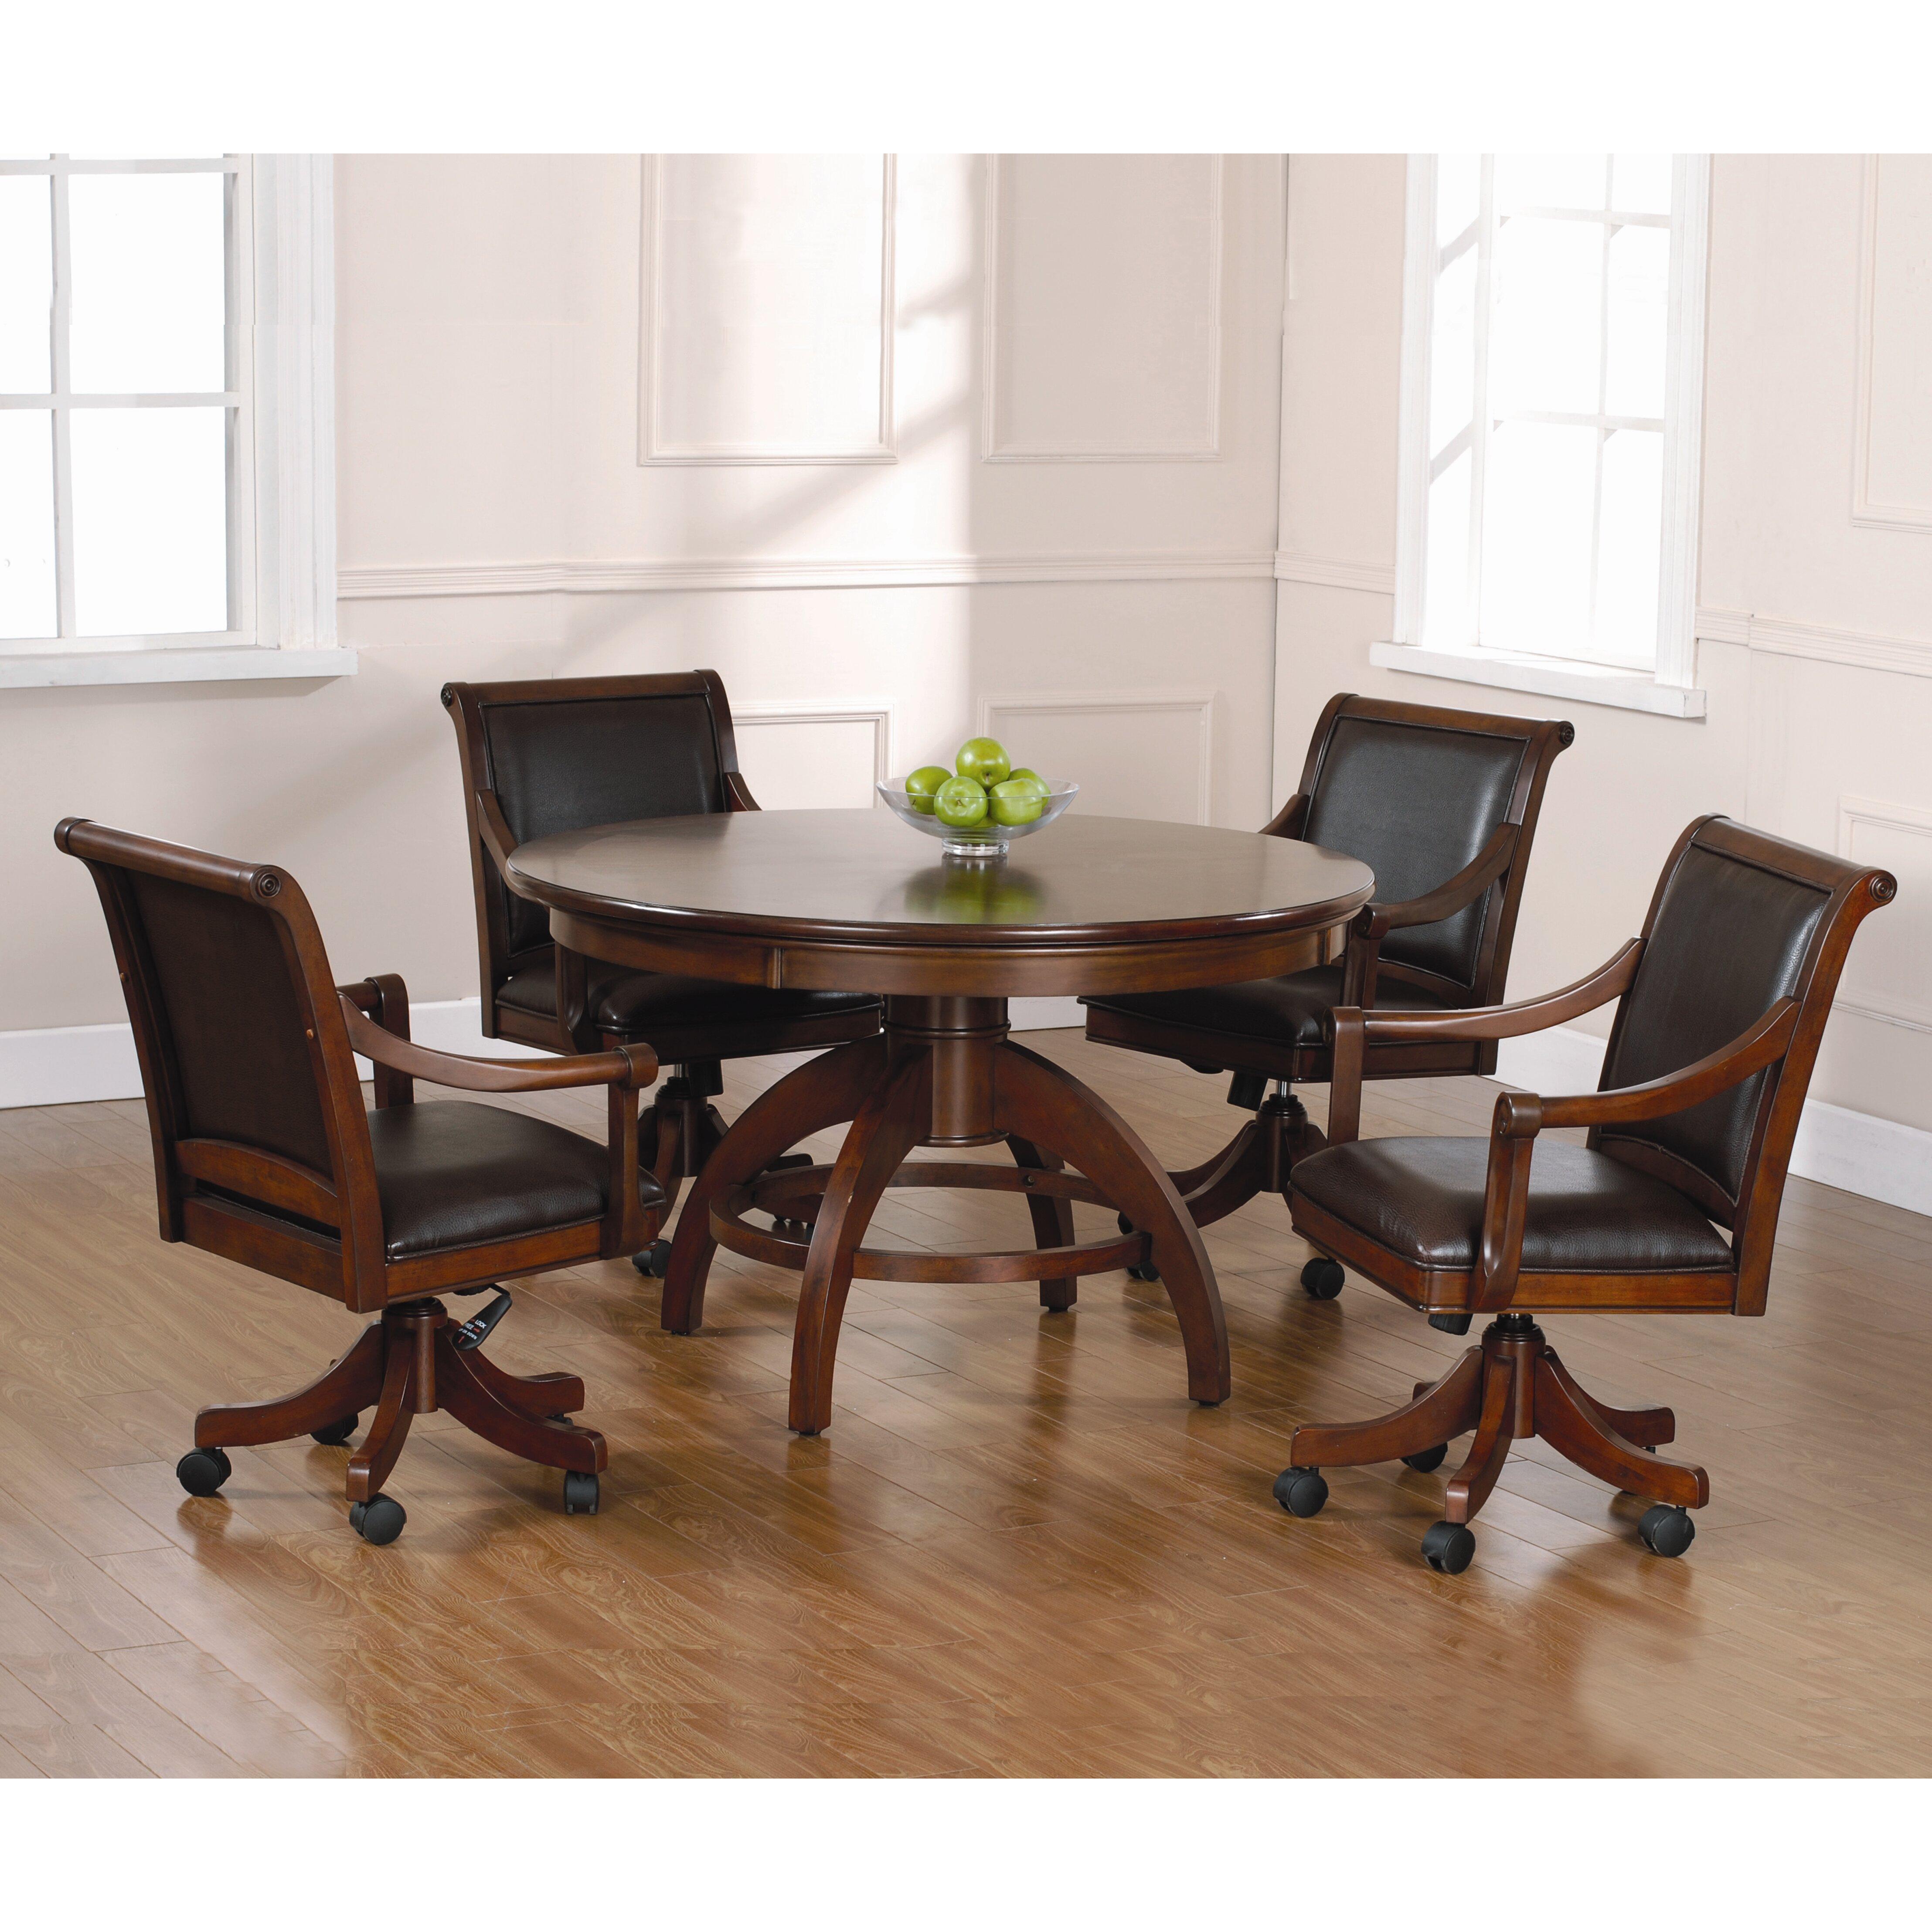 Leather Swivel Dining Room Chairs ~ kukiel.us